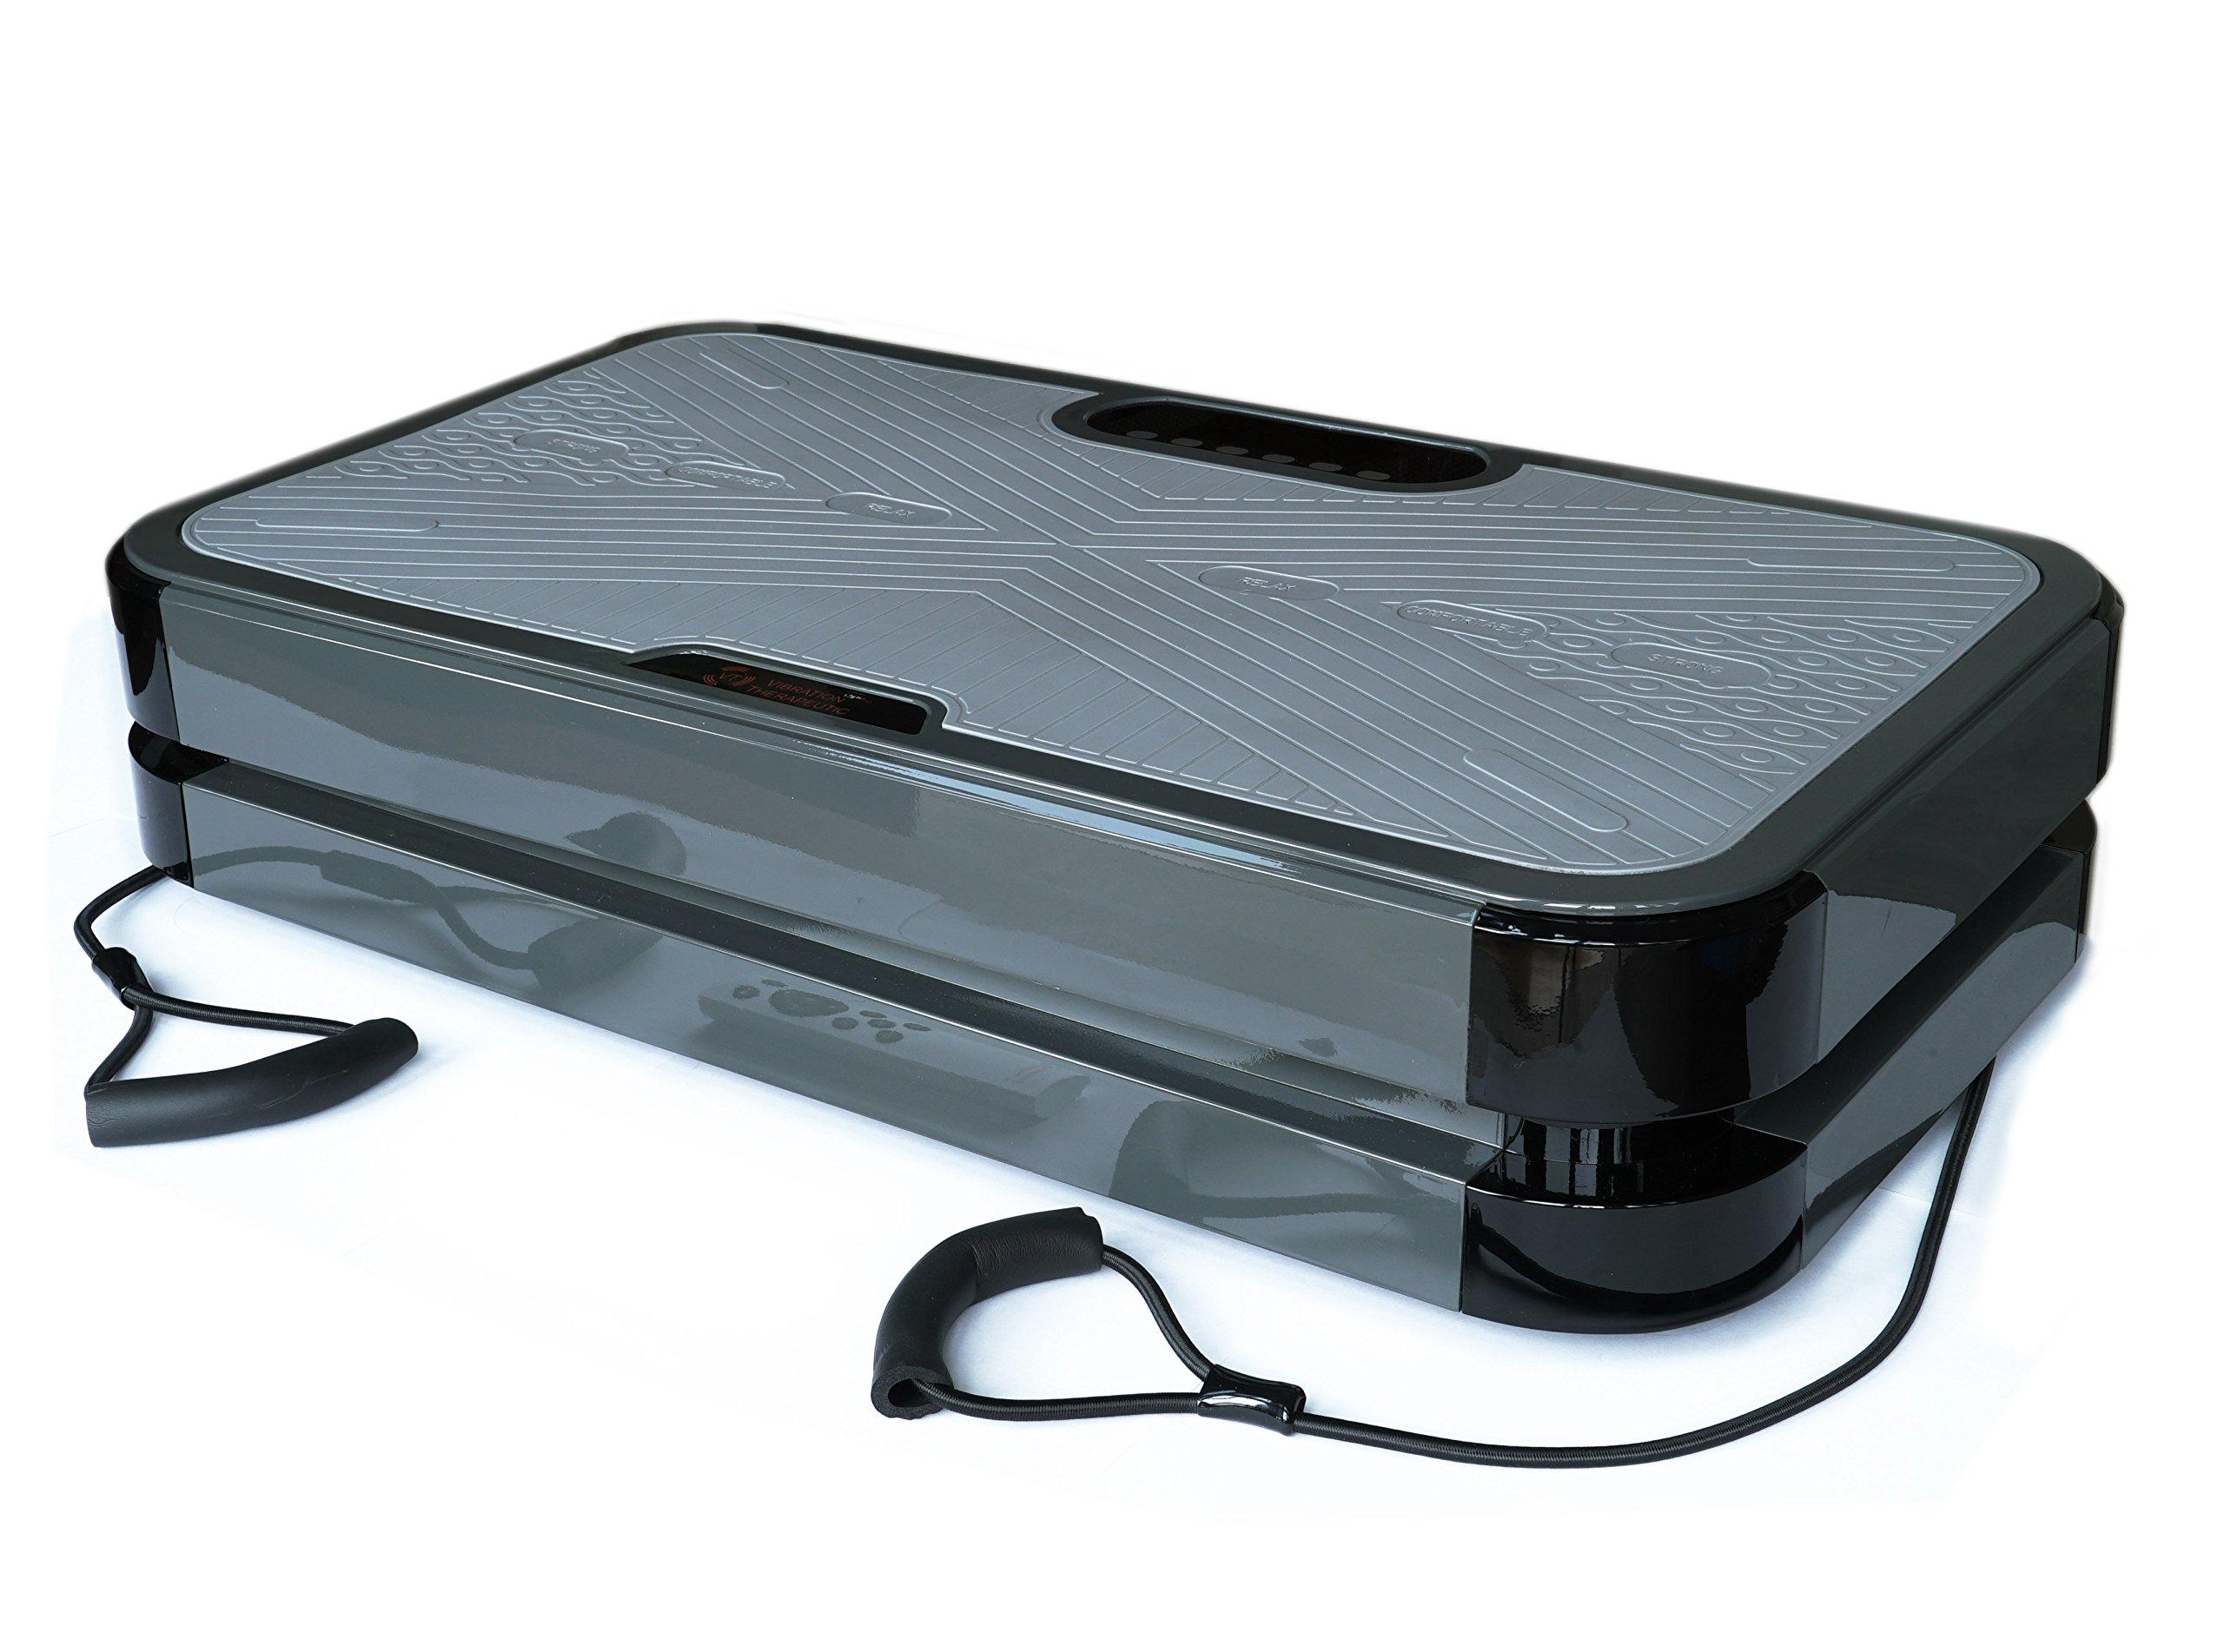 VT Full Body Vibration Platform Fitness Machine - Pivotal Oscillation - Fine Craftsmanship - Powerful yet Quiet - Bluetooth Speaker, VT020-3